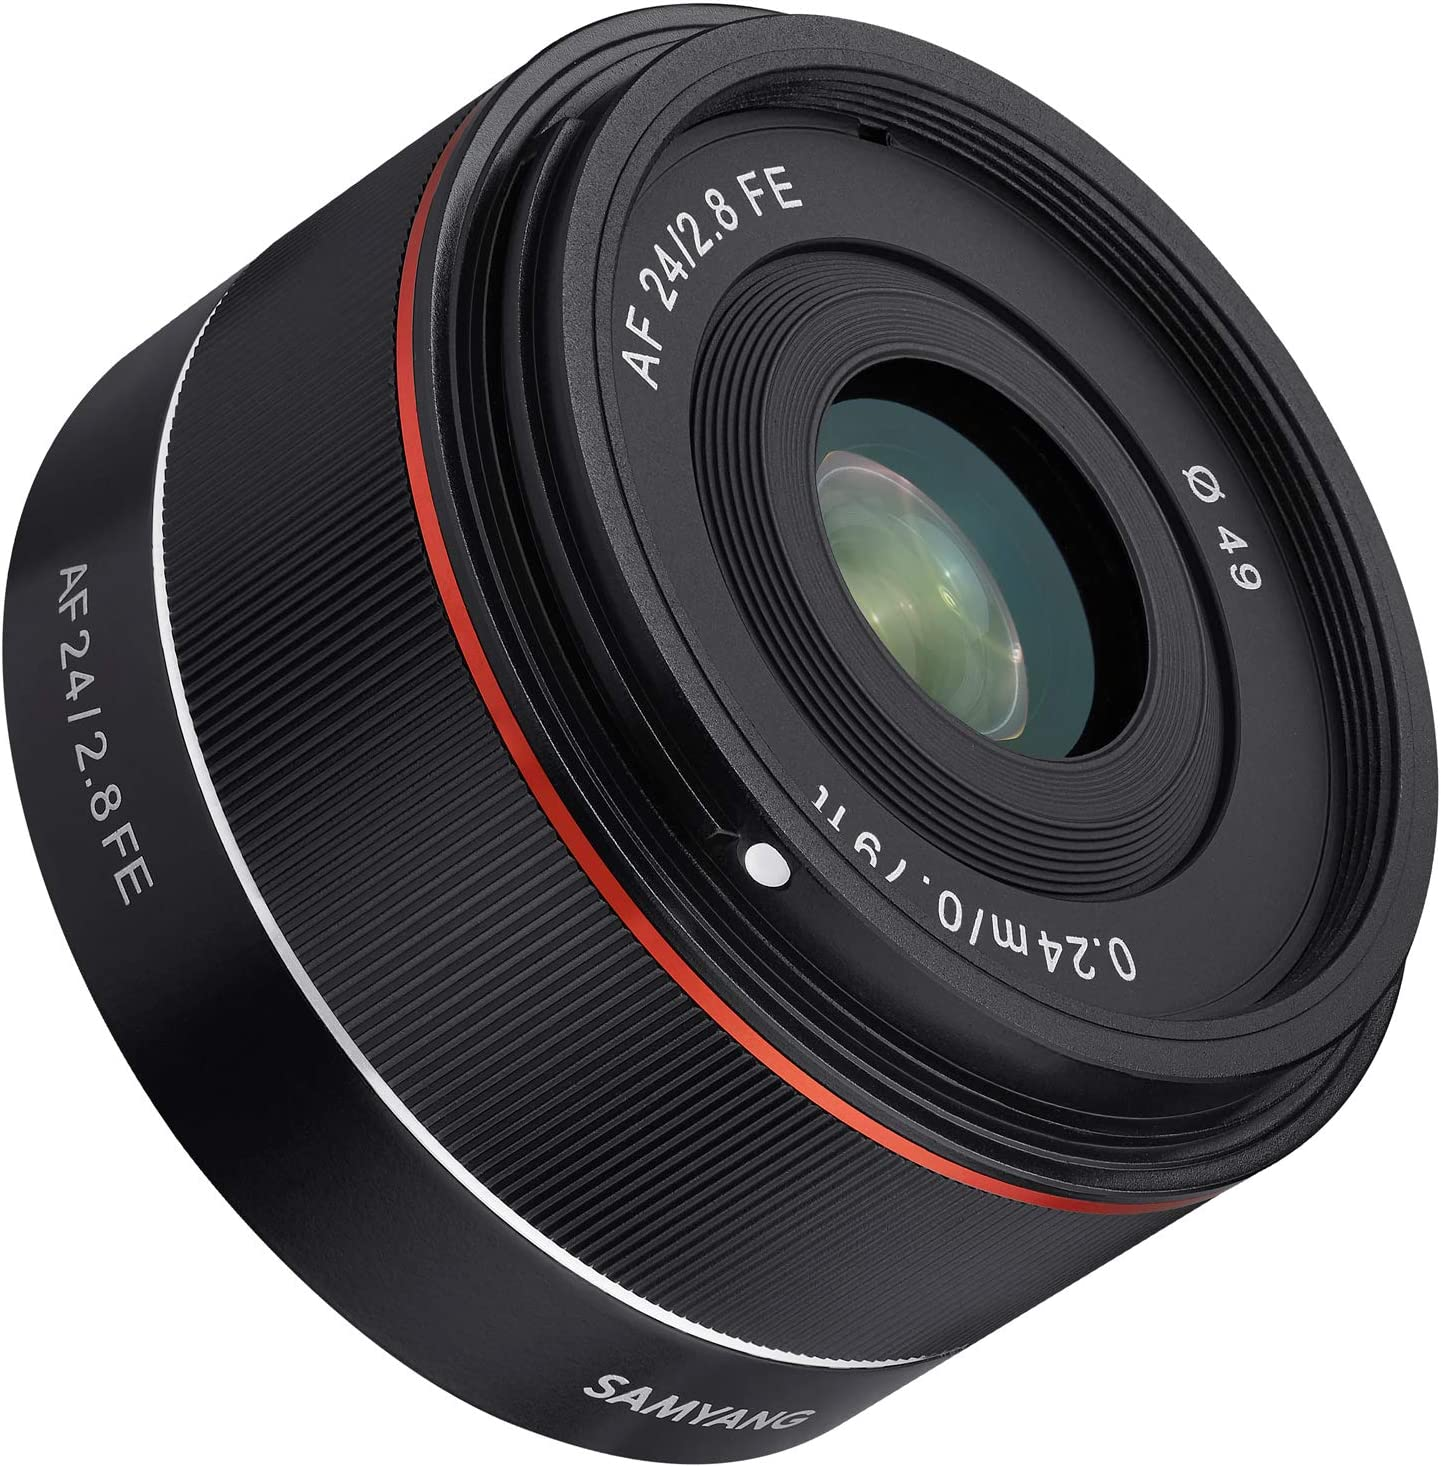 德亞人氣產品 Samyang 森養光學 AF 24mm F2.8 FE 定焦鏡頭